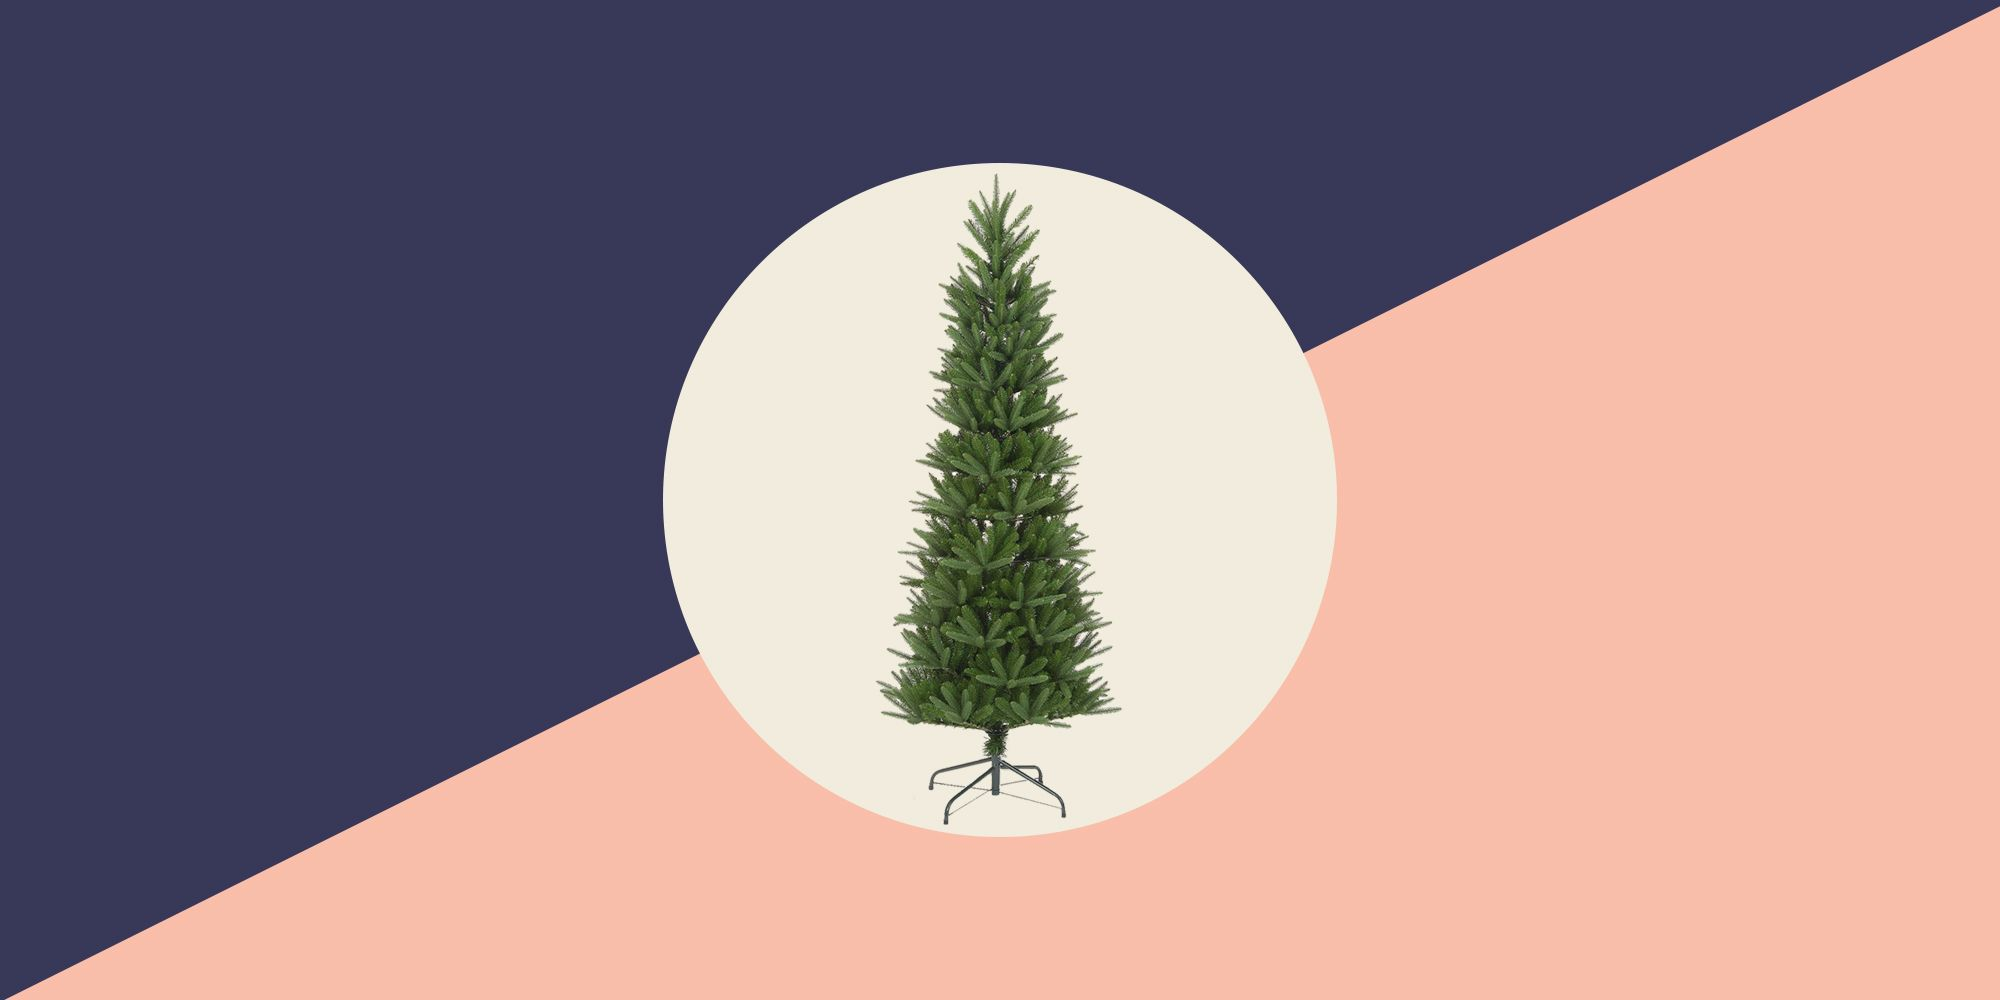 Tall Skinny Christmas Tree Silhouette.25 Slim Christmas Trees For Small Spaces Pencil Christmas